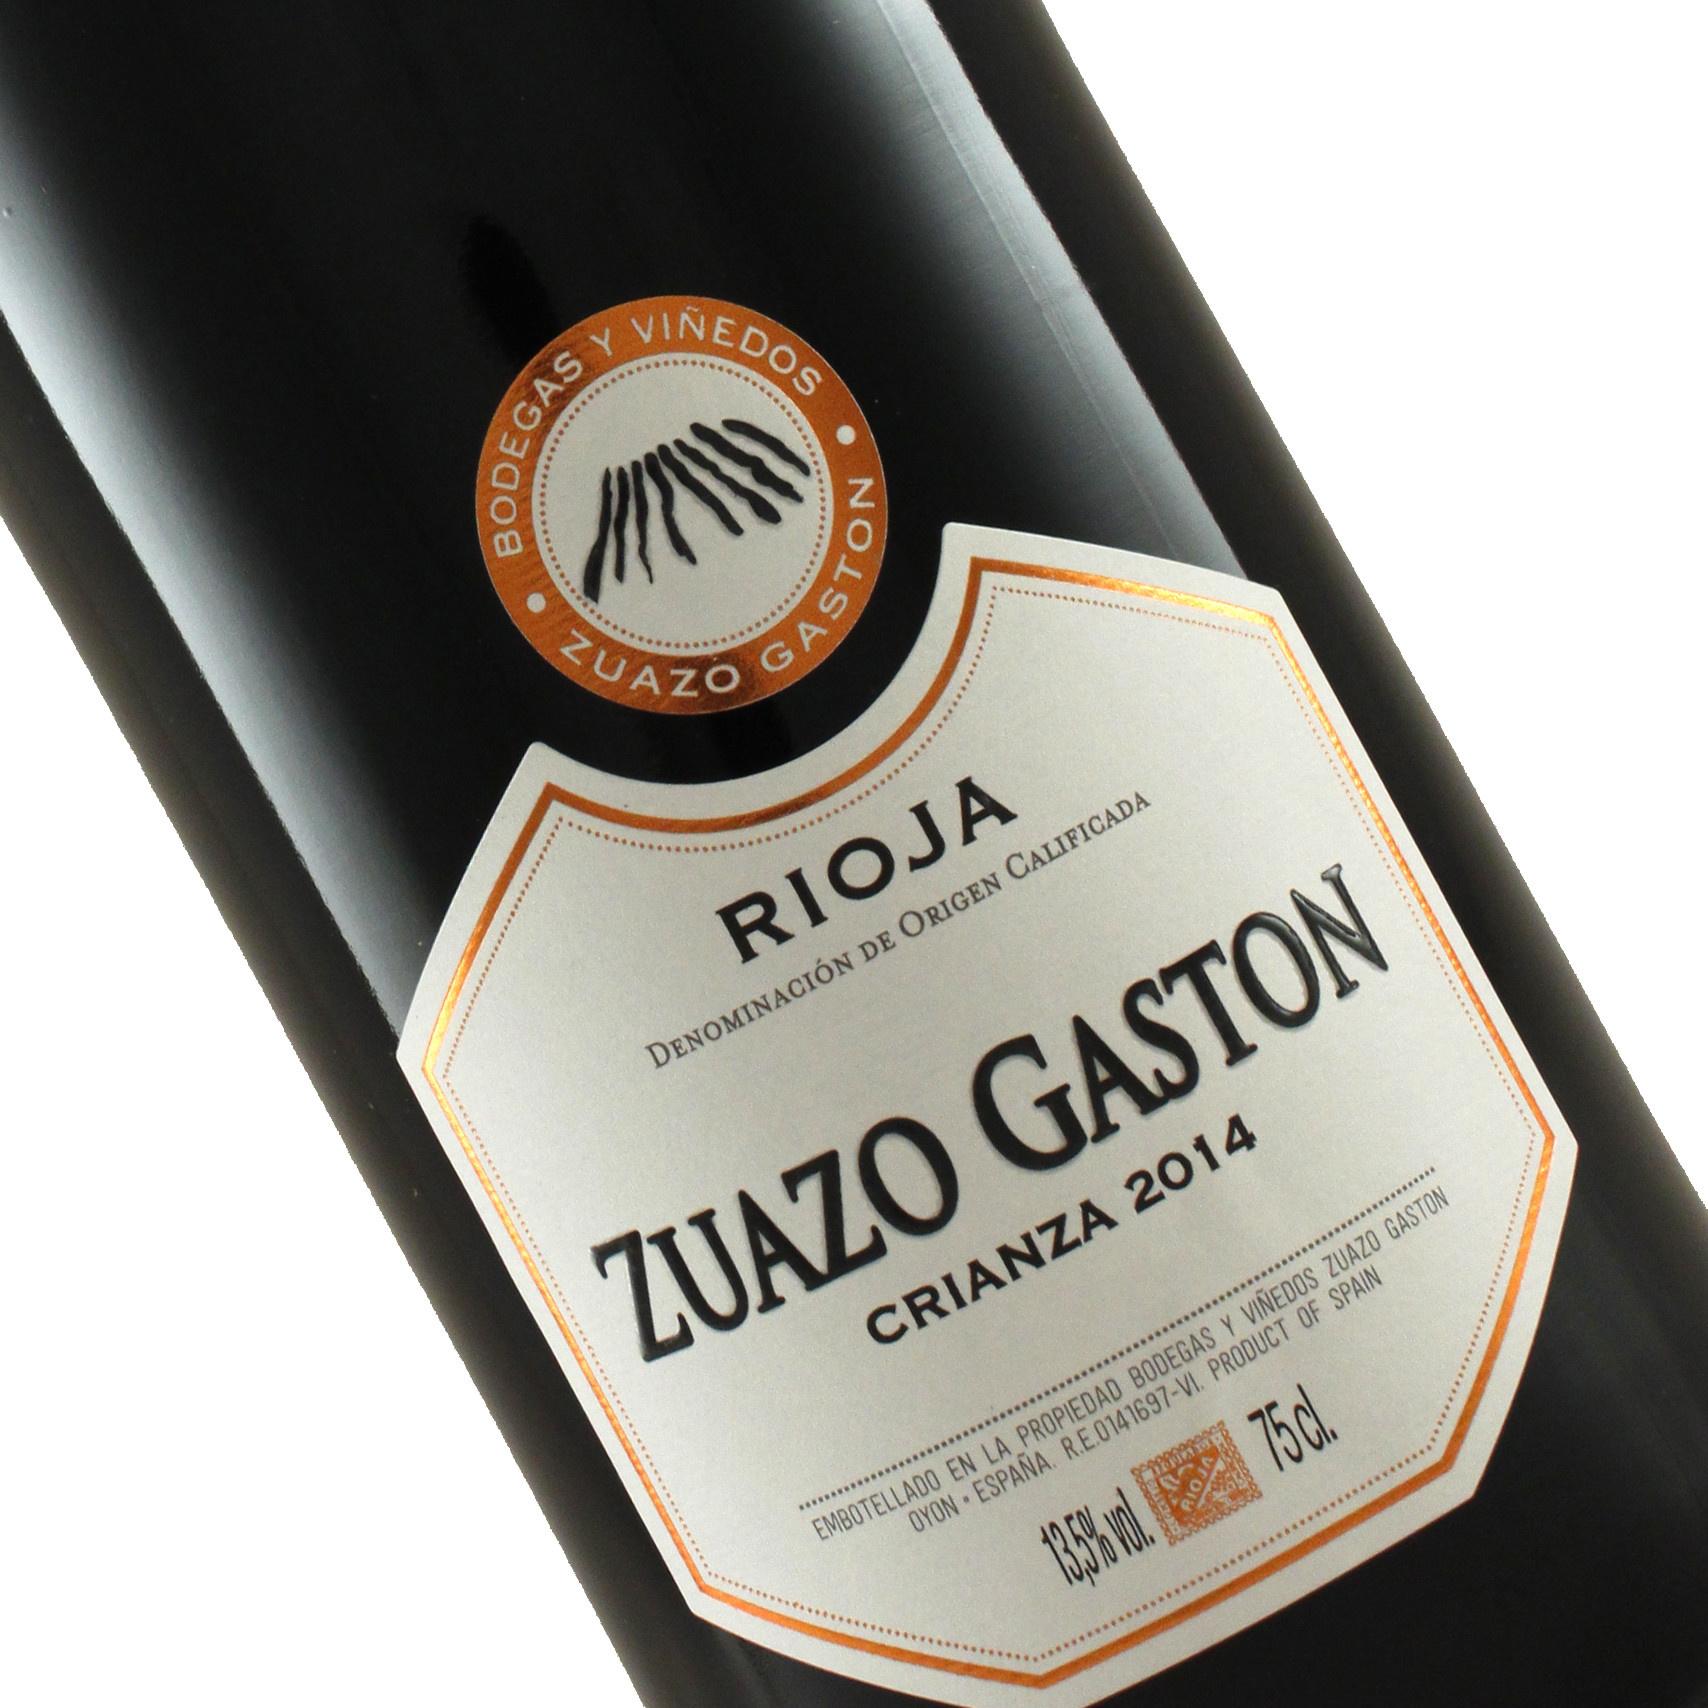 Zuazo Gaston 2014 Rioja Crianza